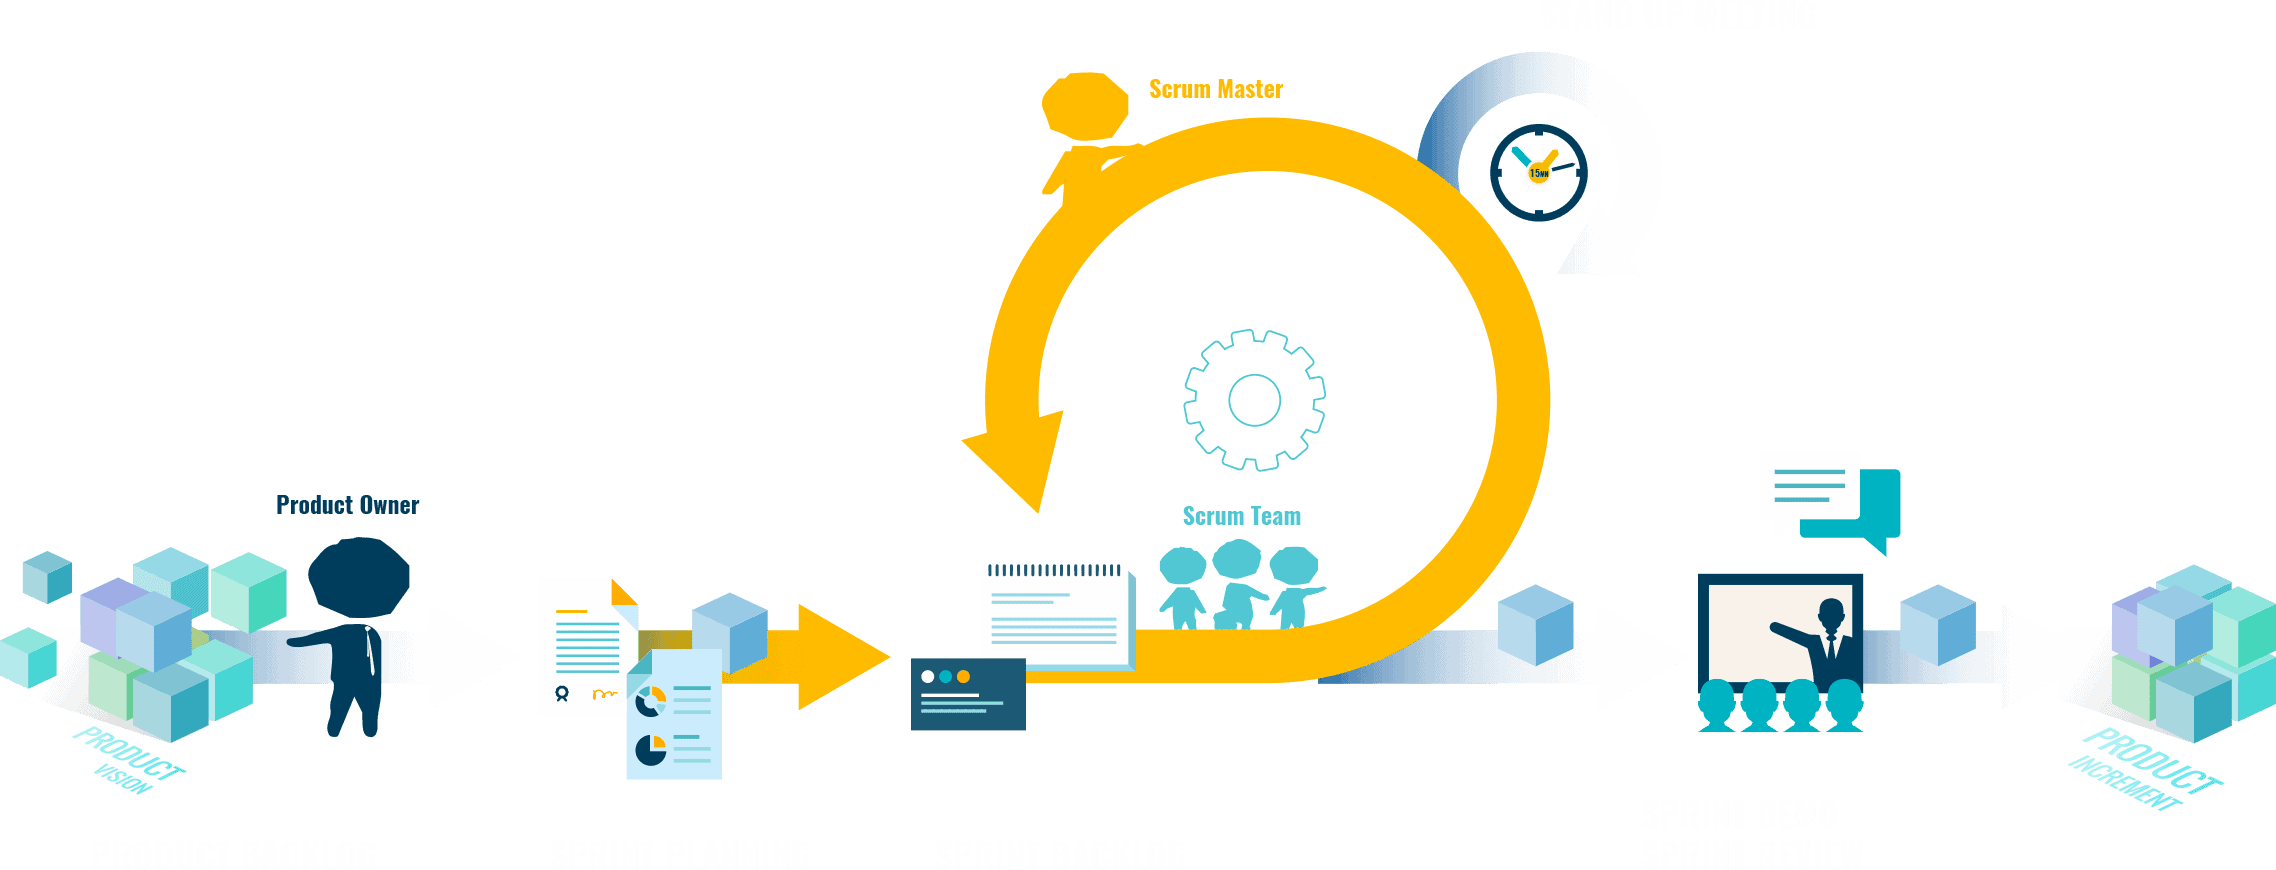 agile method process